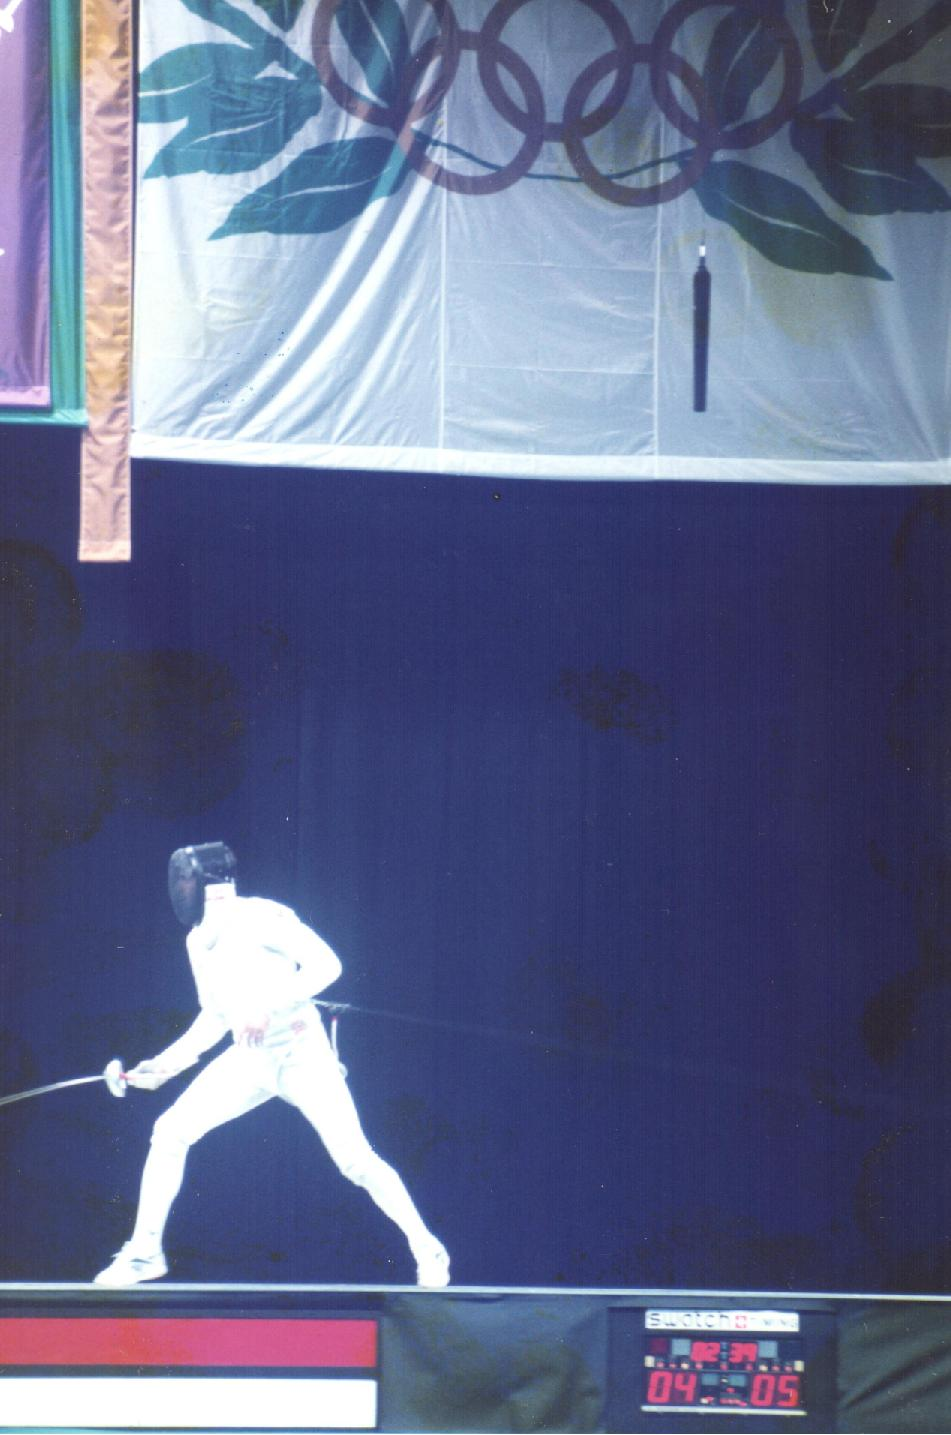 ARTOS 1996 - OLYMPISCHE SPIELE IN ATLANTA